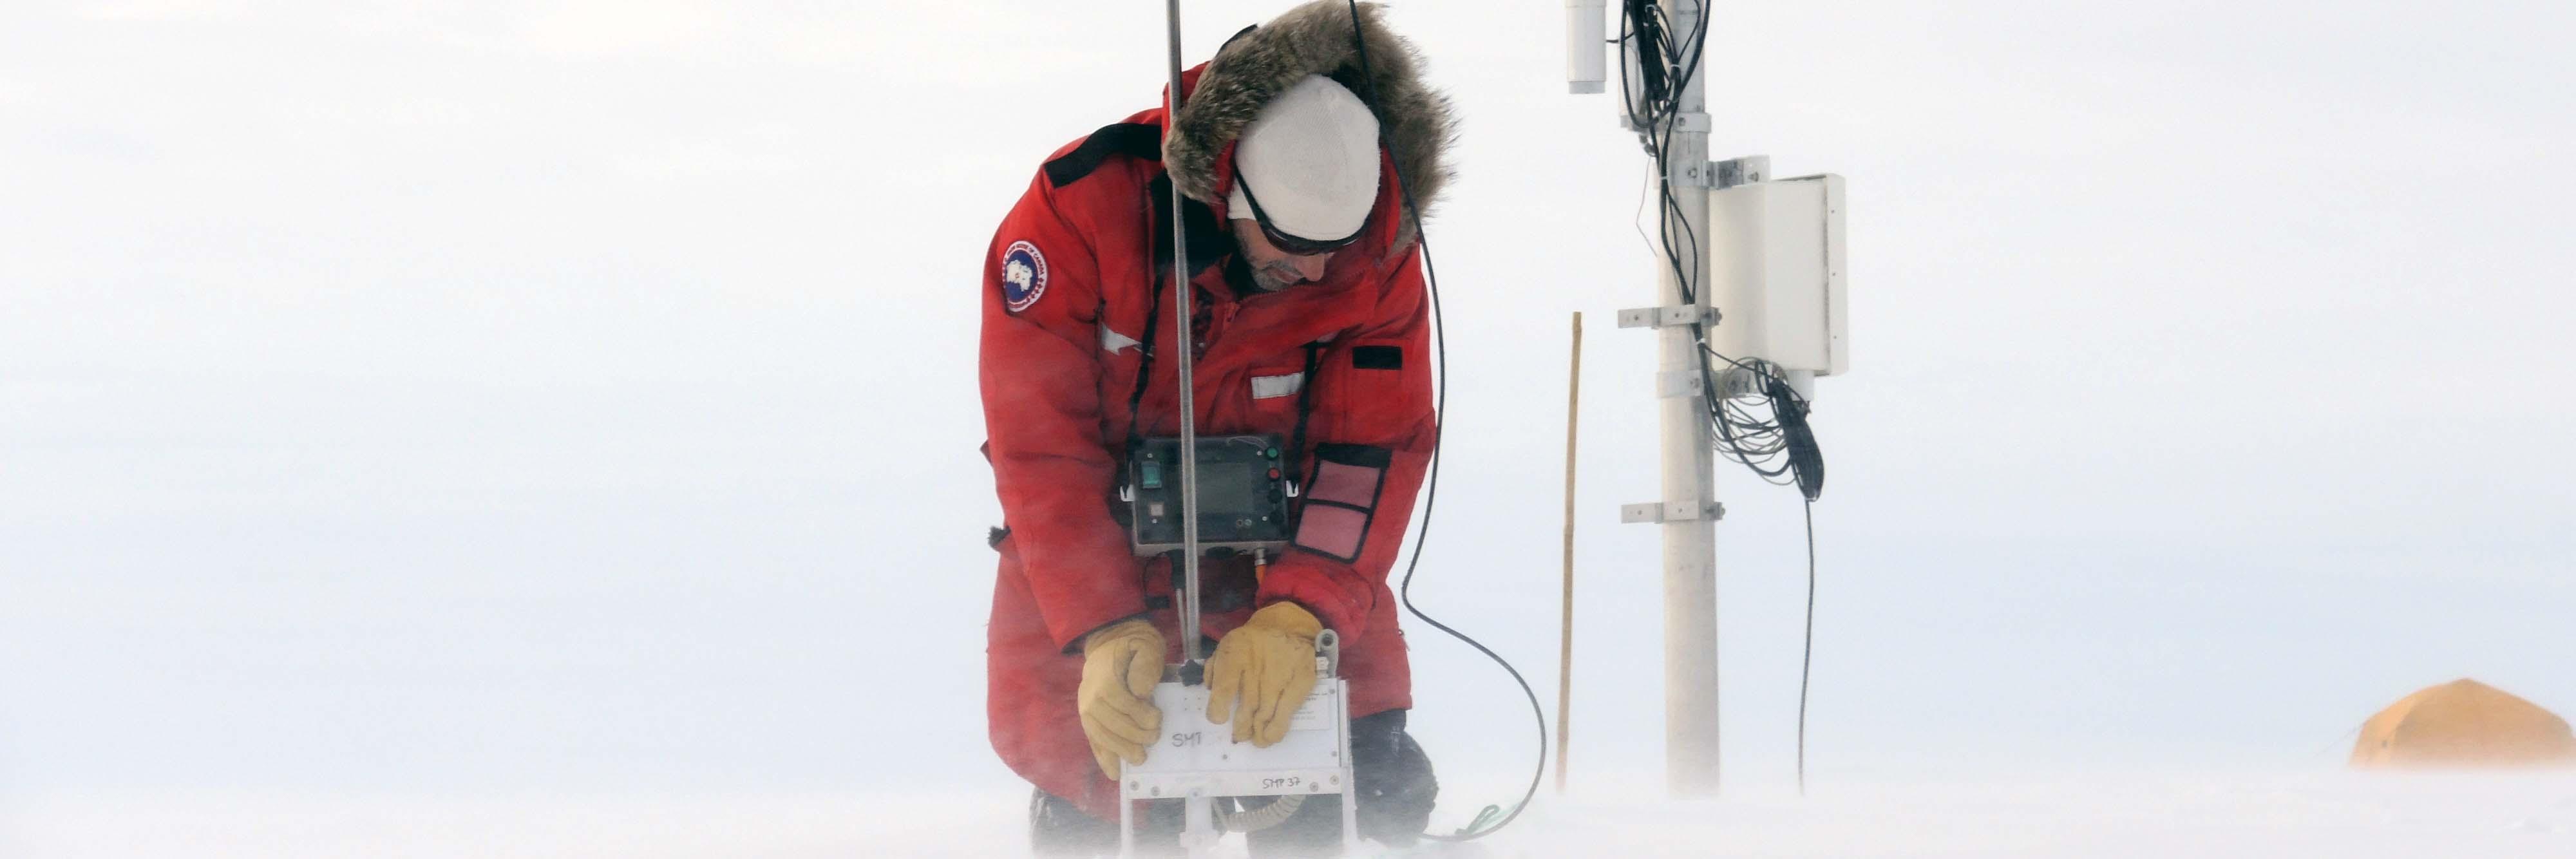 Polar snowpack - WSL